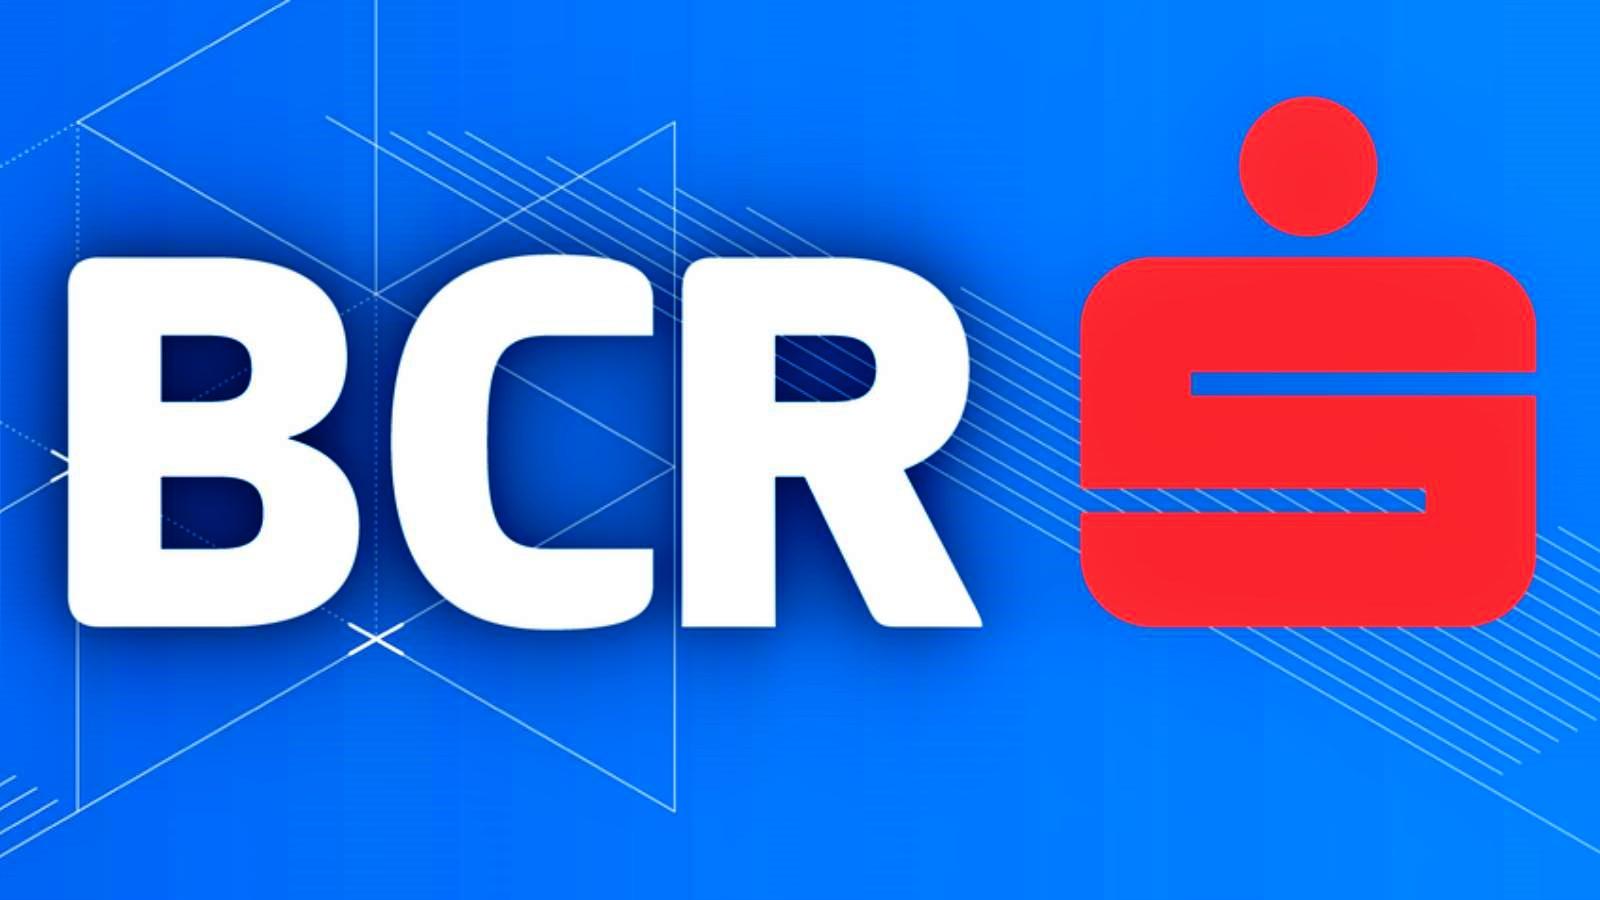 BCR Romania inteligent